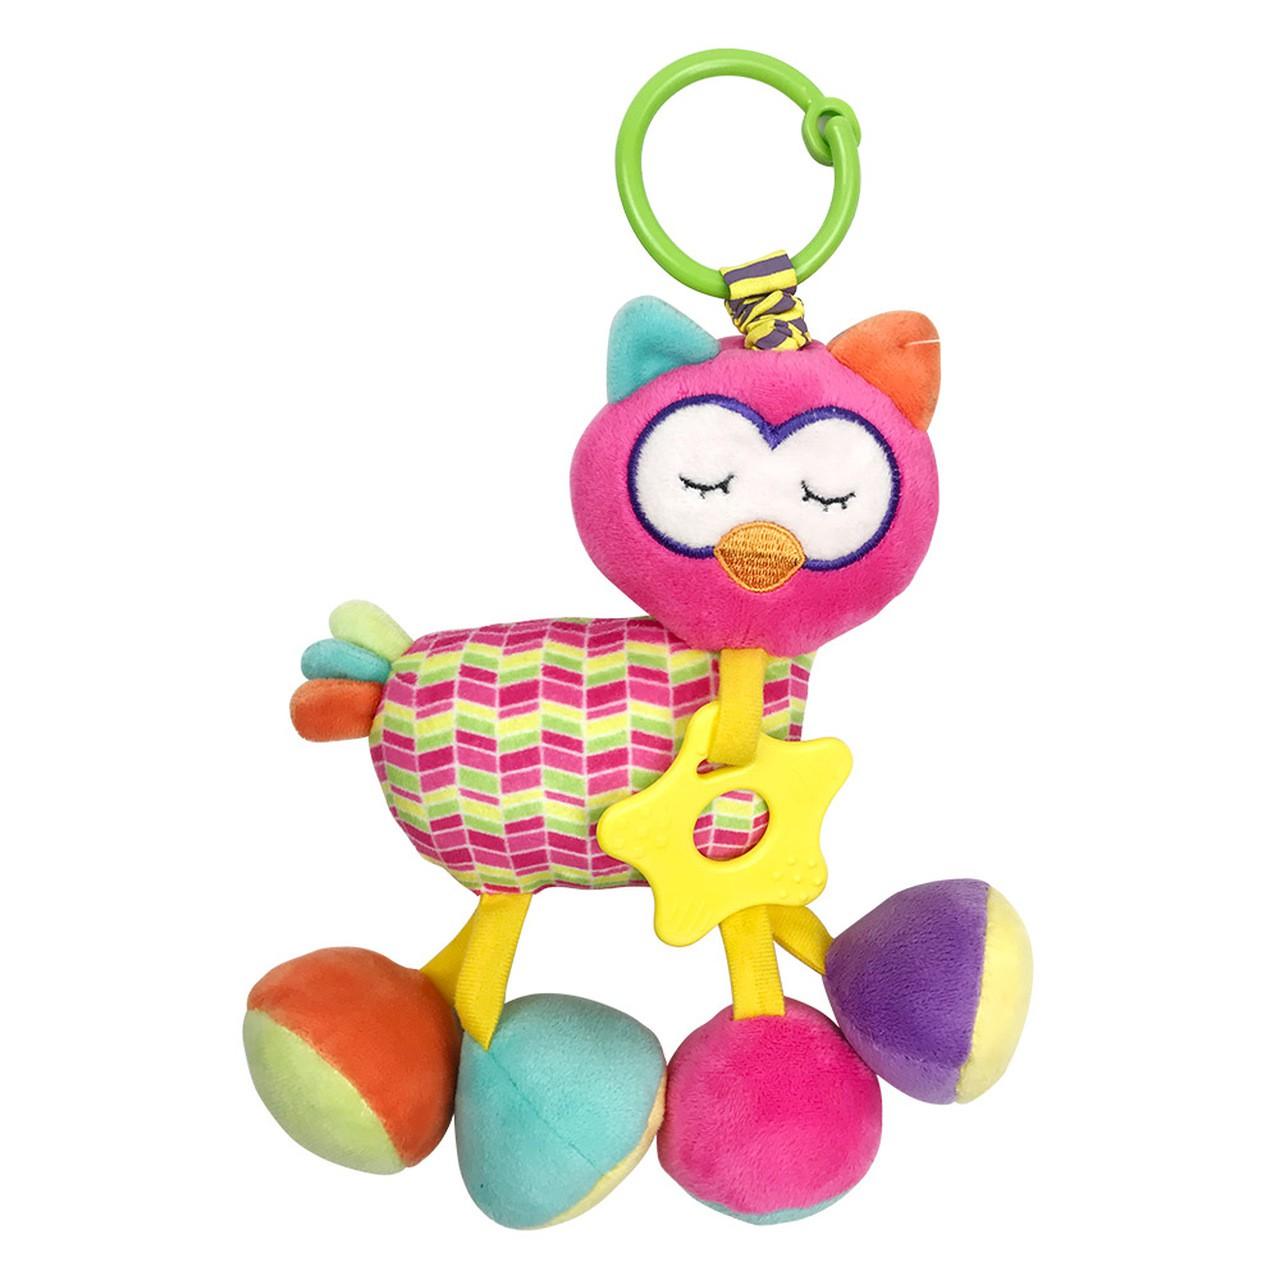 Pelúcia Infantil Corujinha Fofy Chocalho - Dm Toys 5981